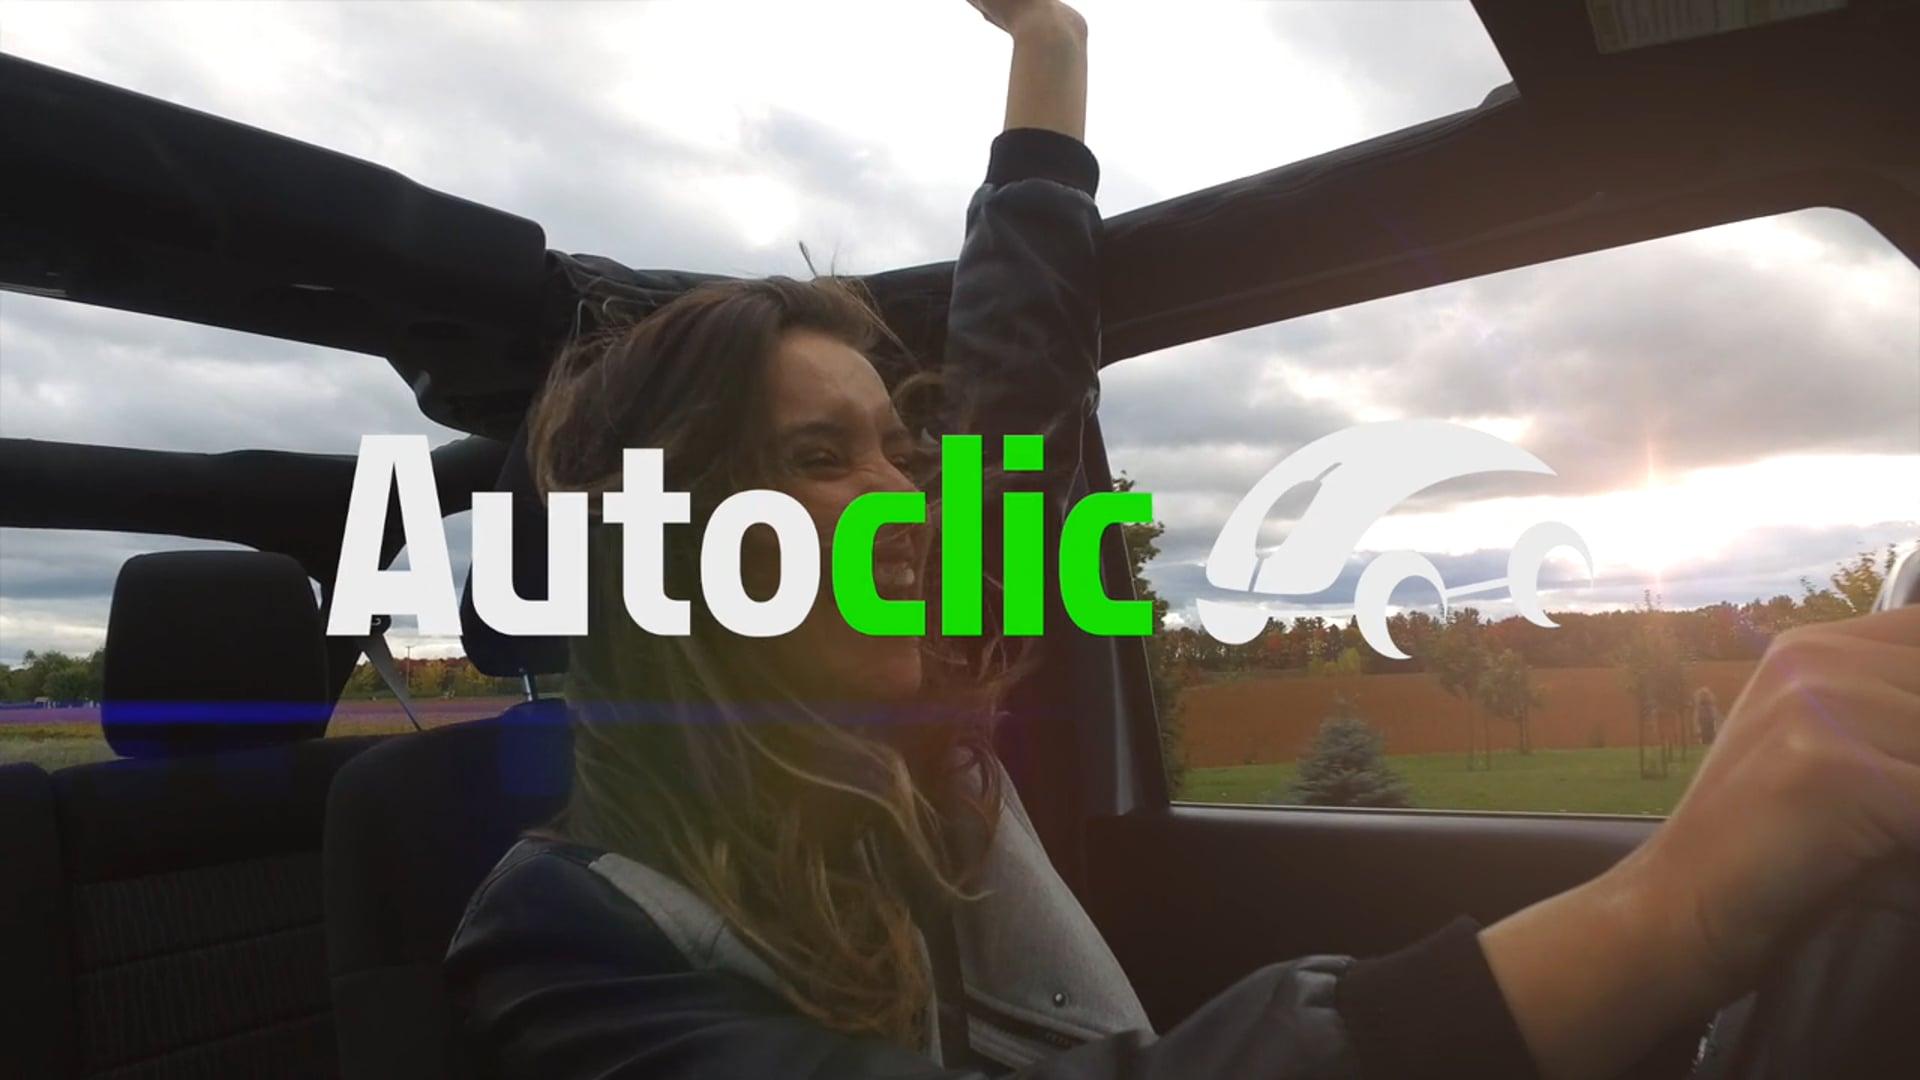 Autoclic